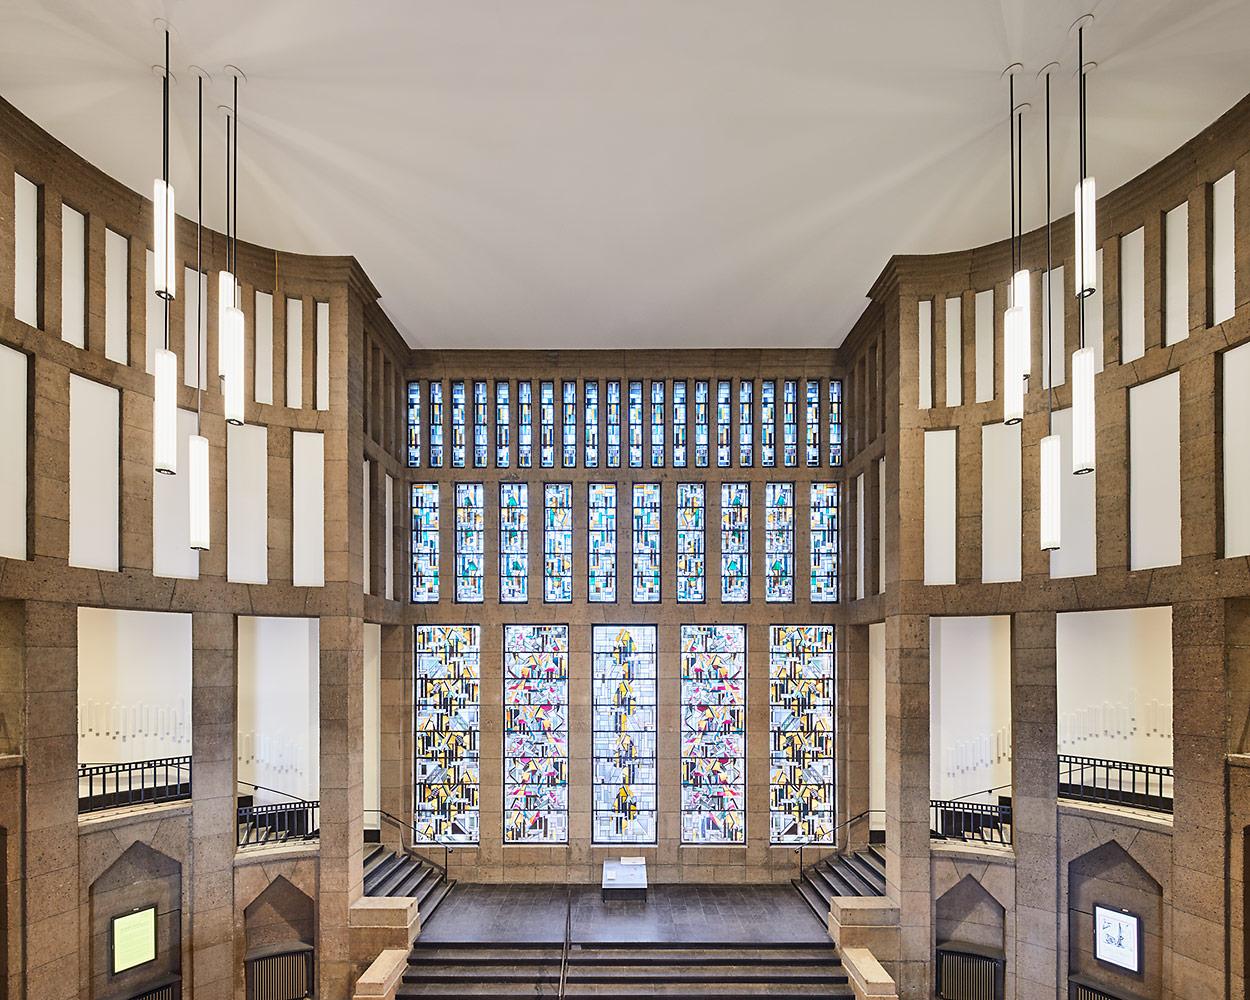 Architekturfotograf Düsseldorf, Museum Kunstpalast, Mawa Design, Düsseldorf